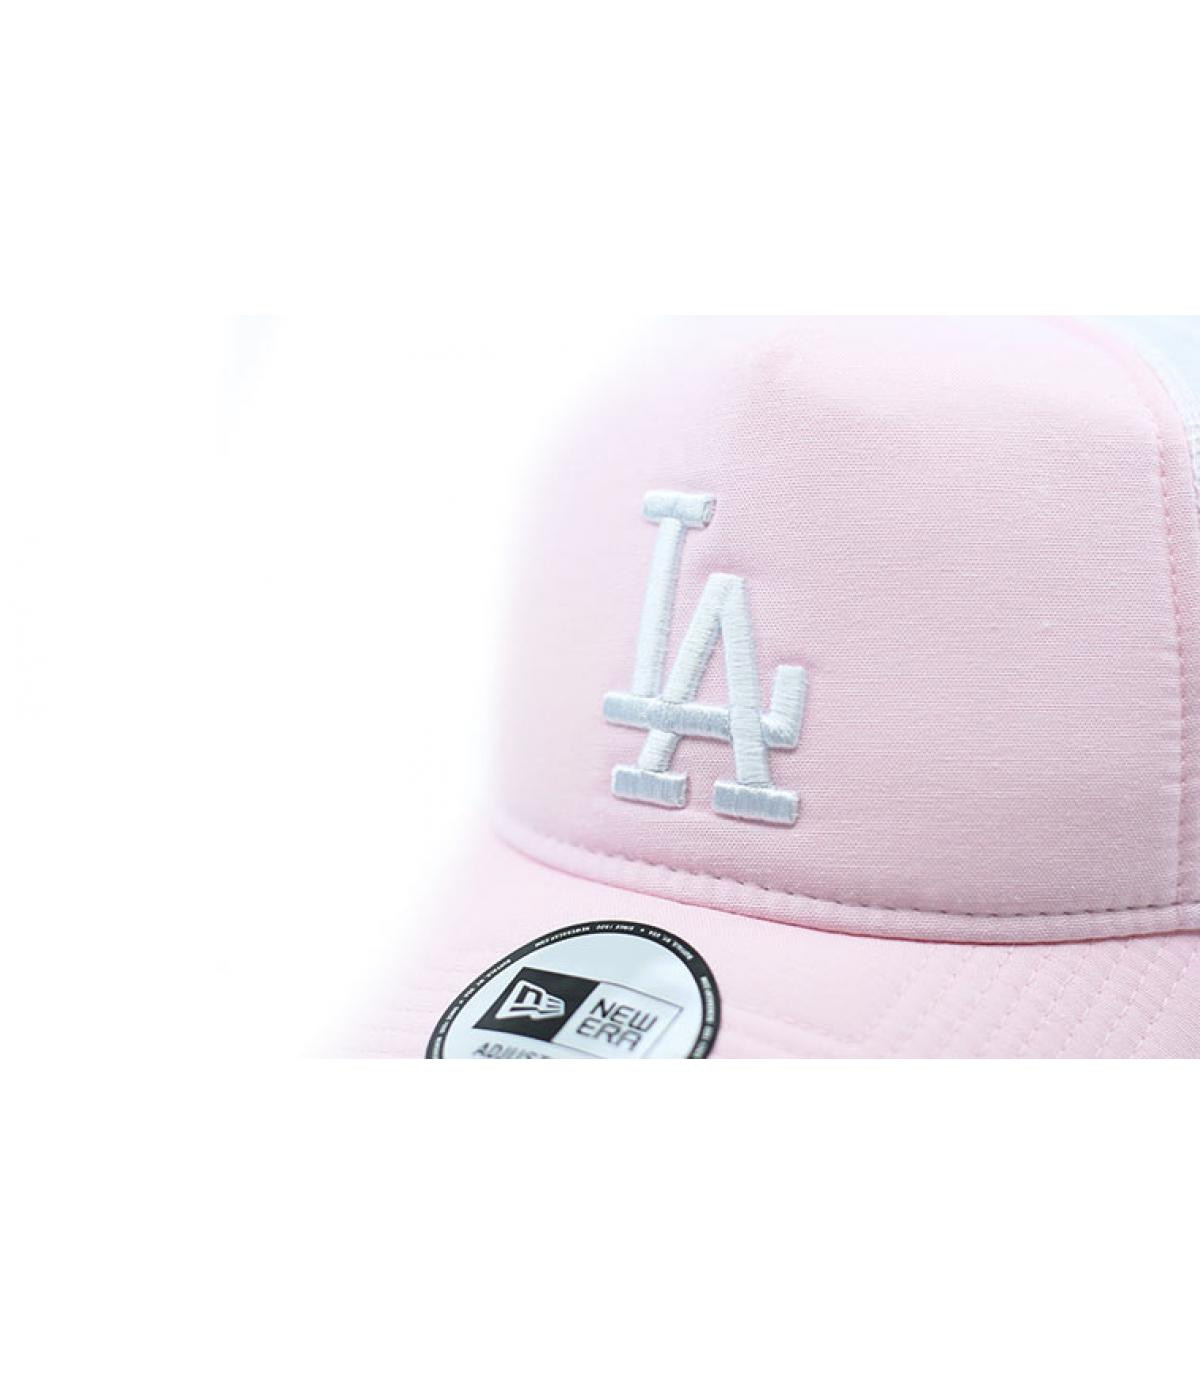 Détails Trucker MLB Oxford LA pink - image 3